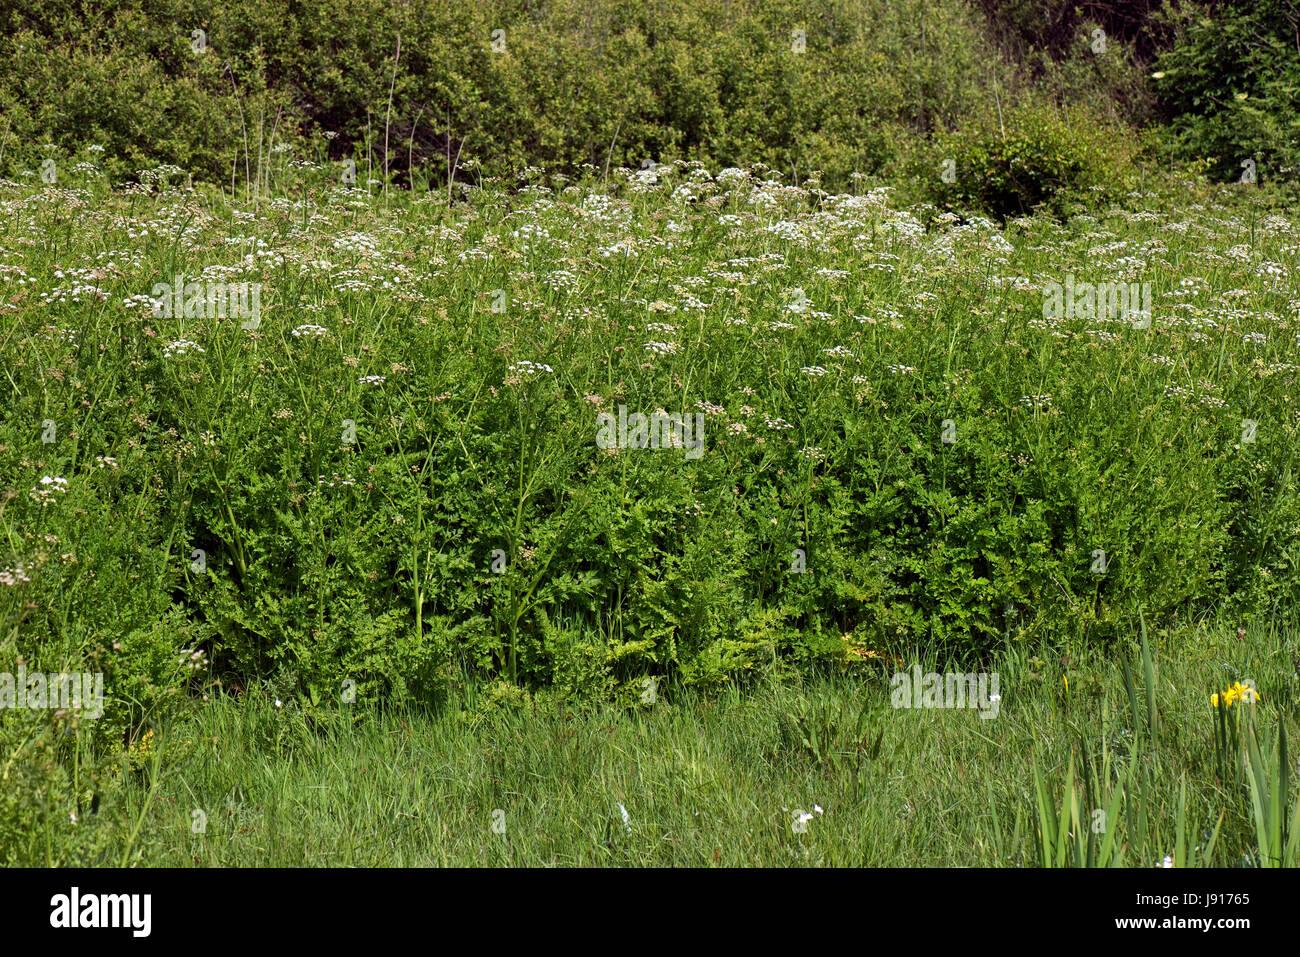 Hemlock water dropwort, Oenanthe crocata, banks of extremely poisonous umbelliferous plant in marshy area behind - Stock Image